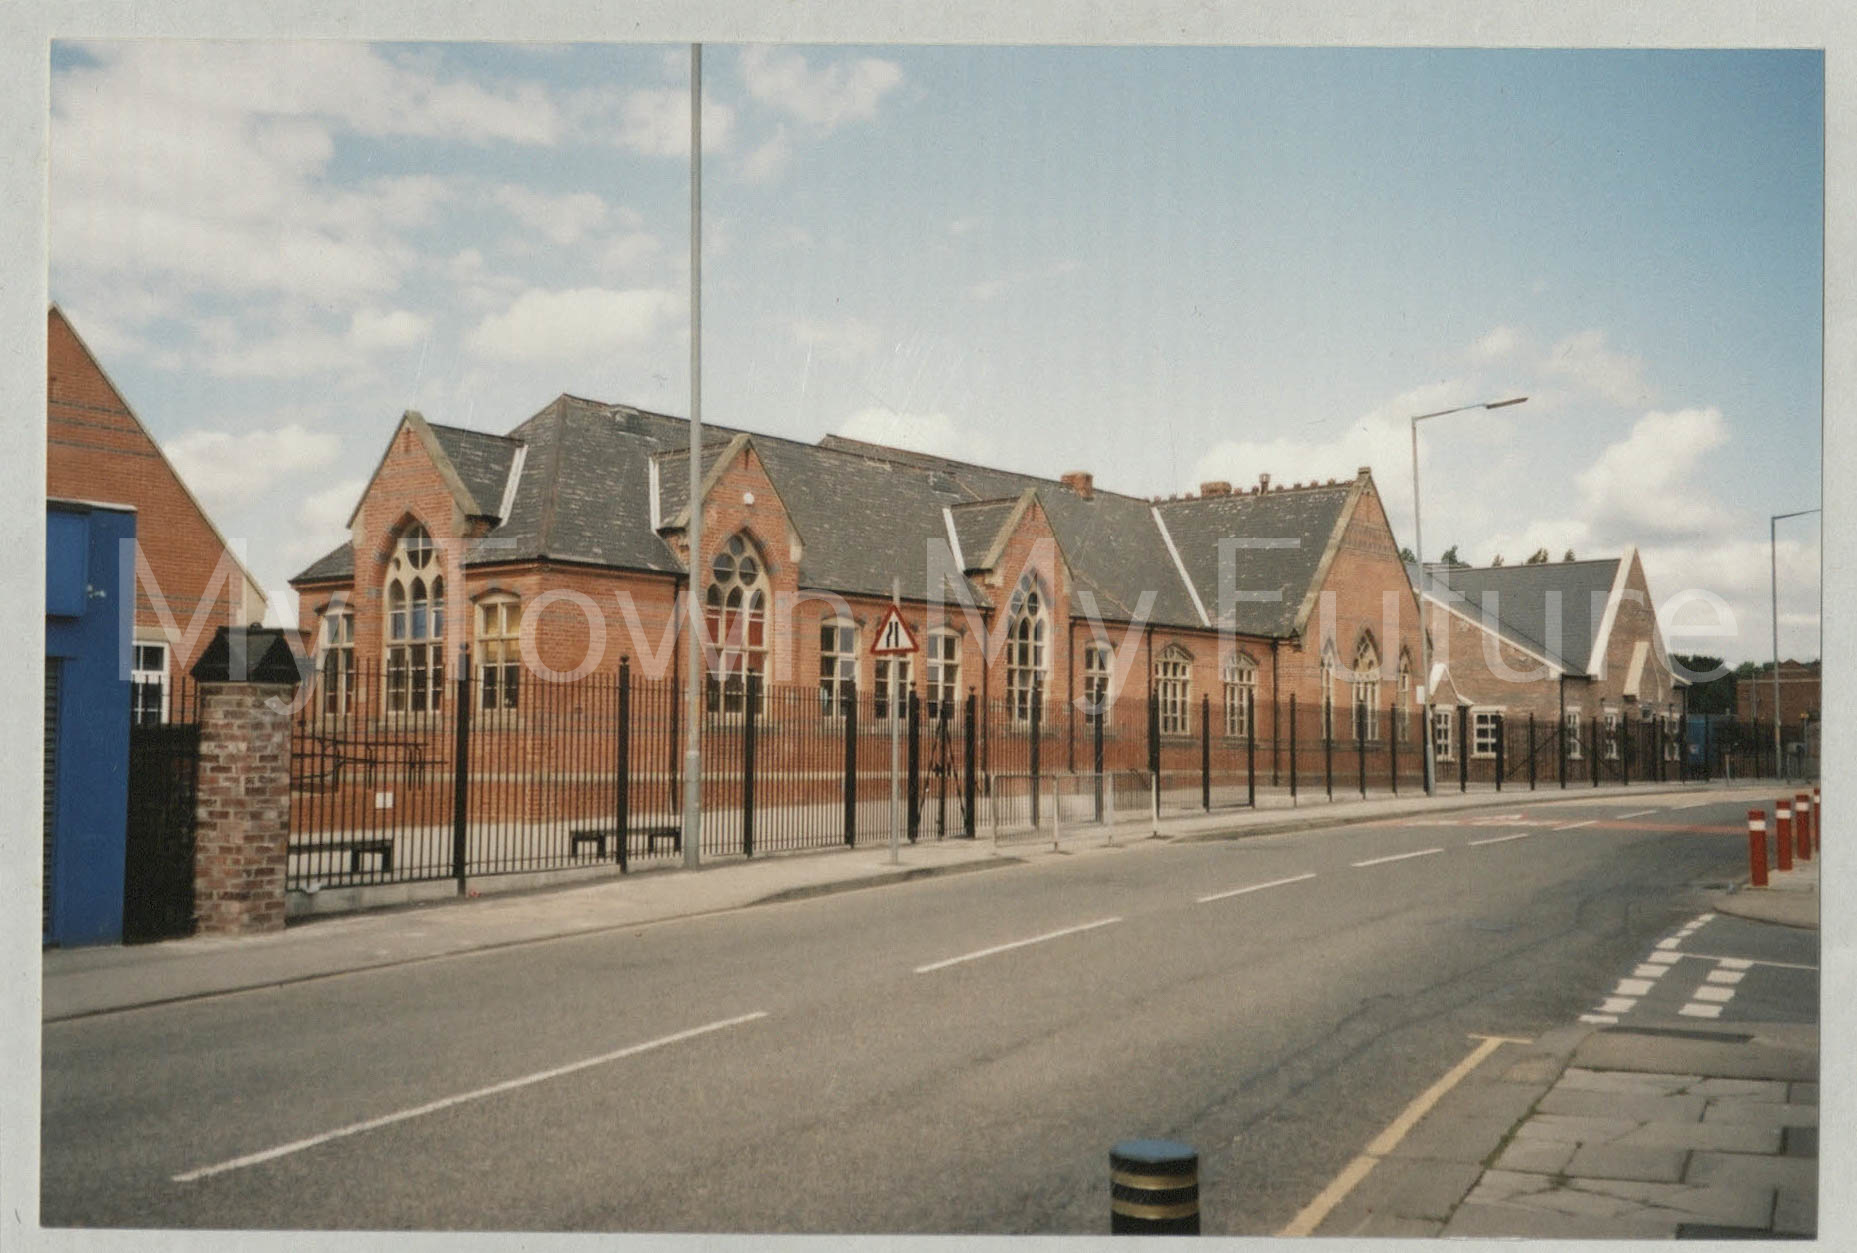 Linthorpe School (2004).